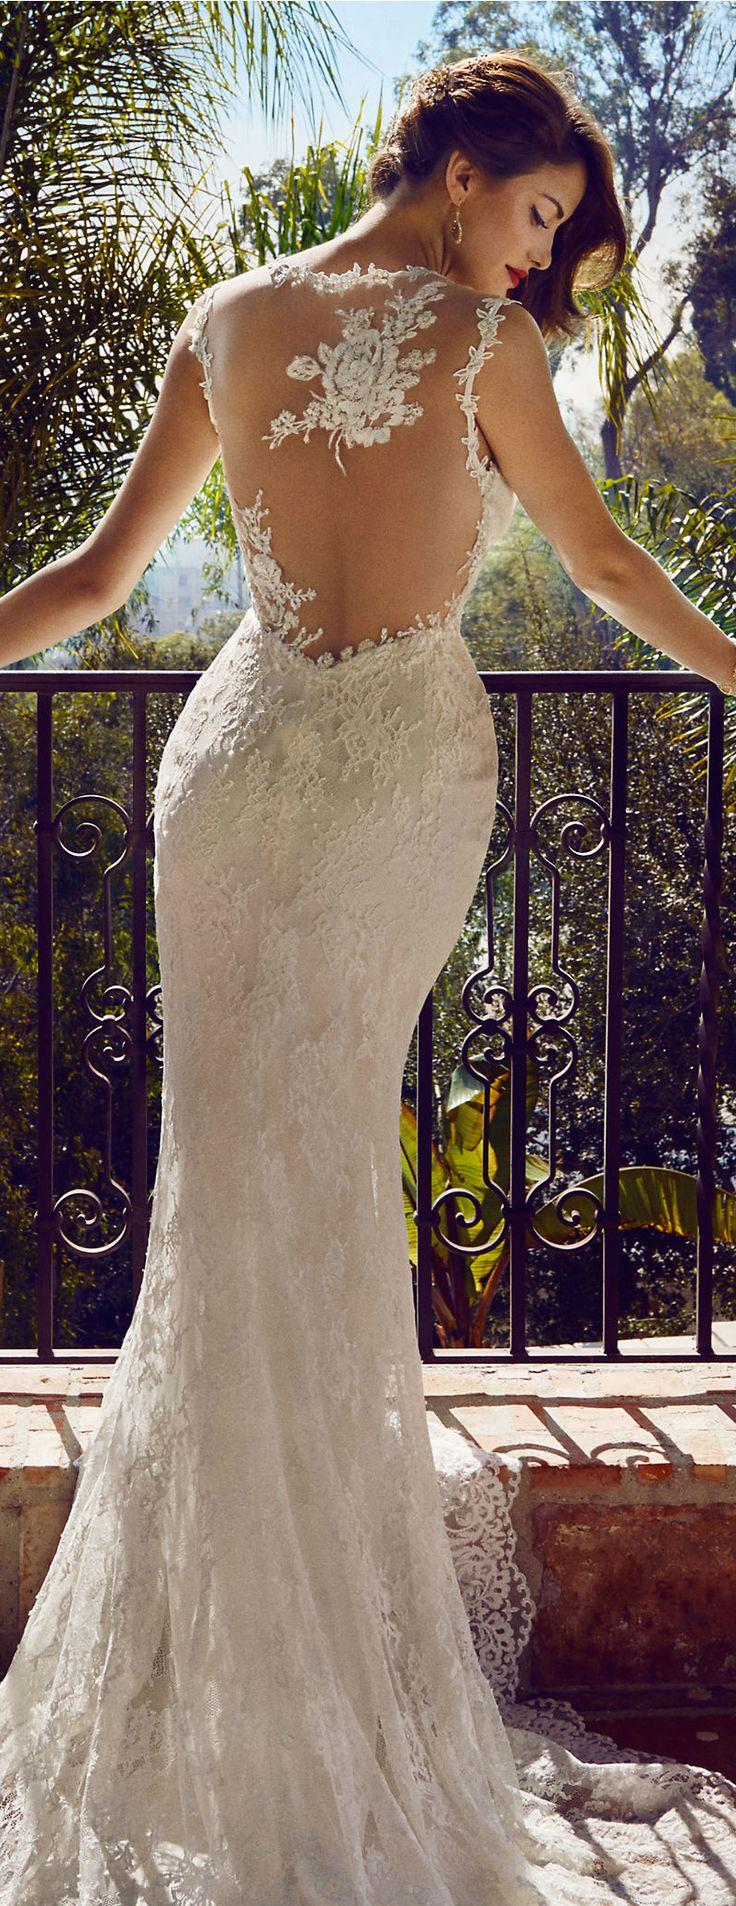 best nude wedding images on pinterest weddings wedding ideas